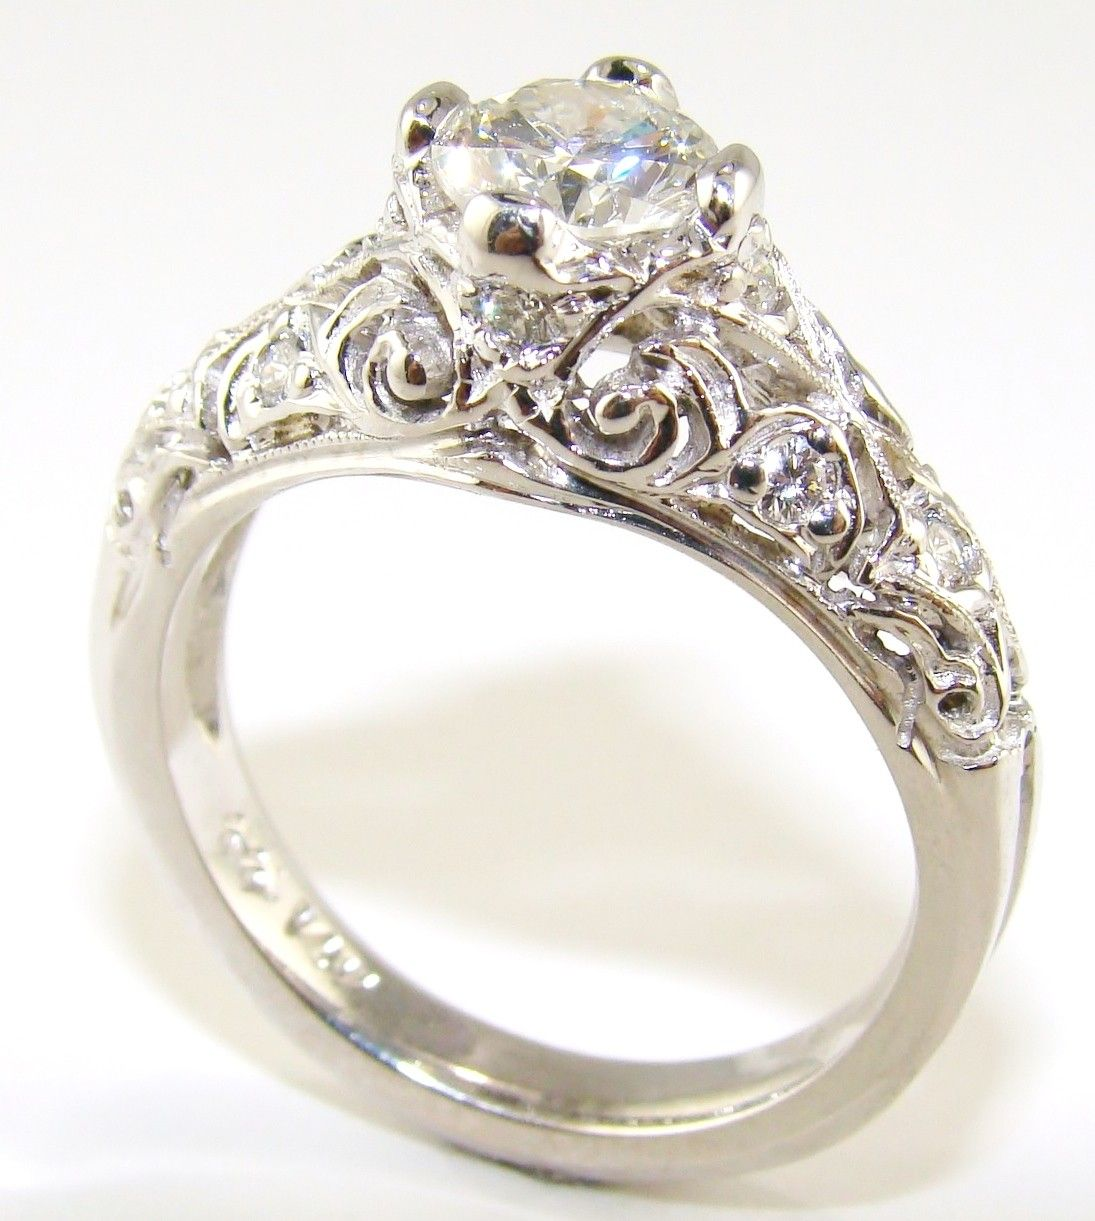 Antique Wedding Ring  Contemporary Antique Engagement Ring